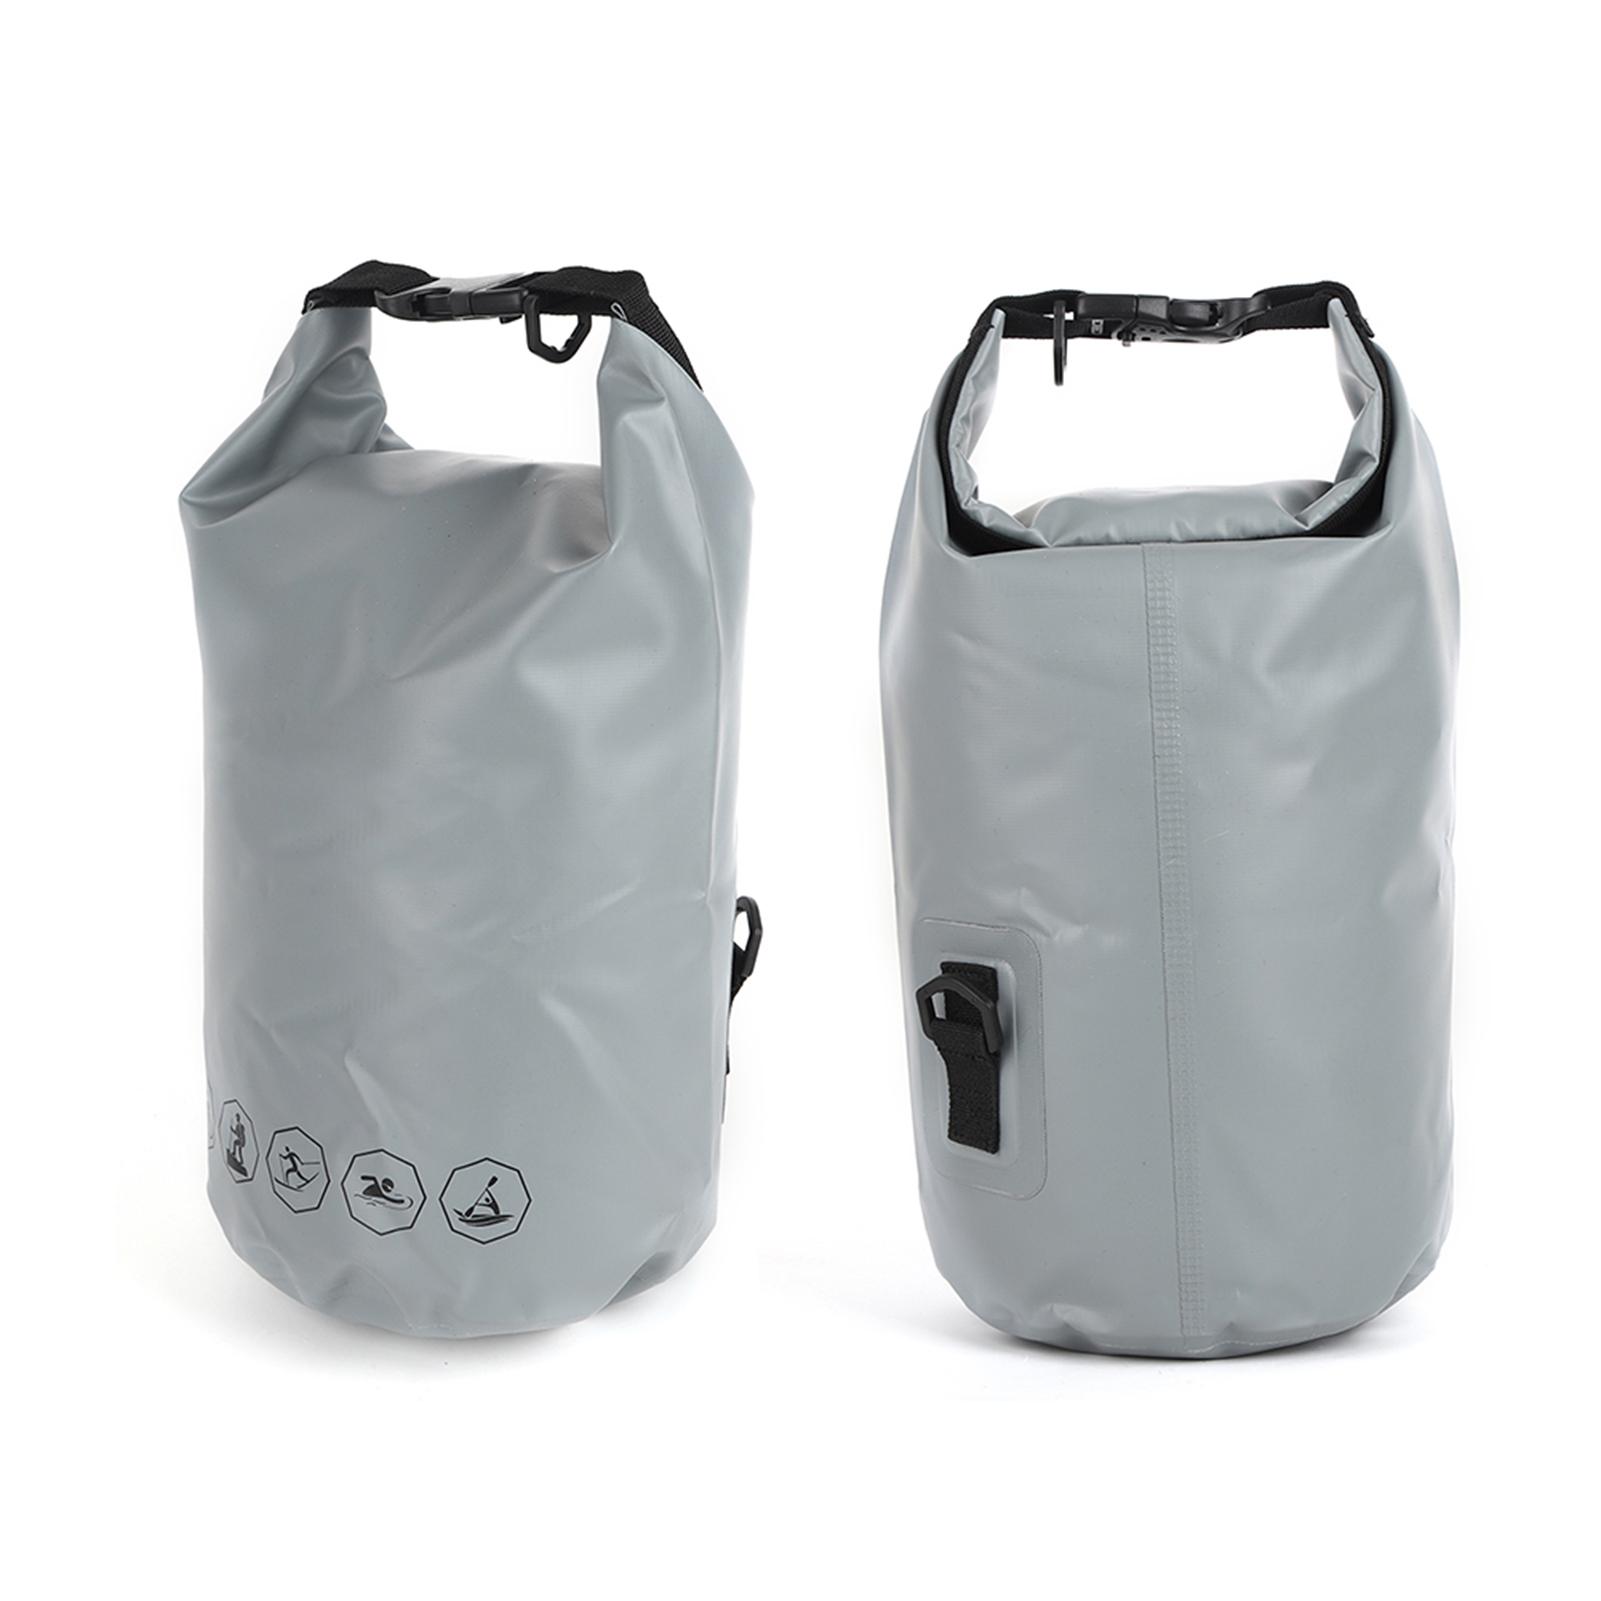 Heavy-Duty-Waterproof-Dry-Bag-10L-Storage-Pack-Summer-Outdoor-Sport-Beach-Bag-DD thumbnail 13